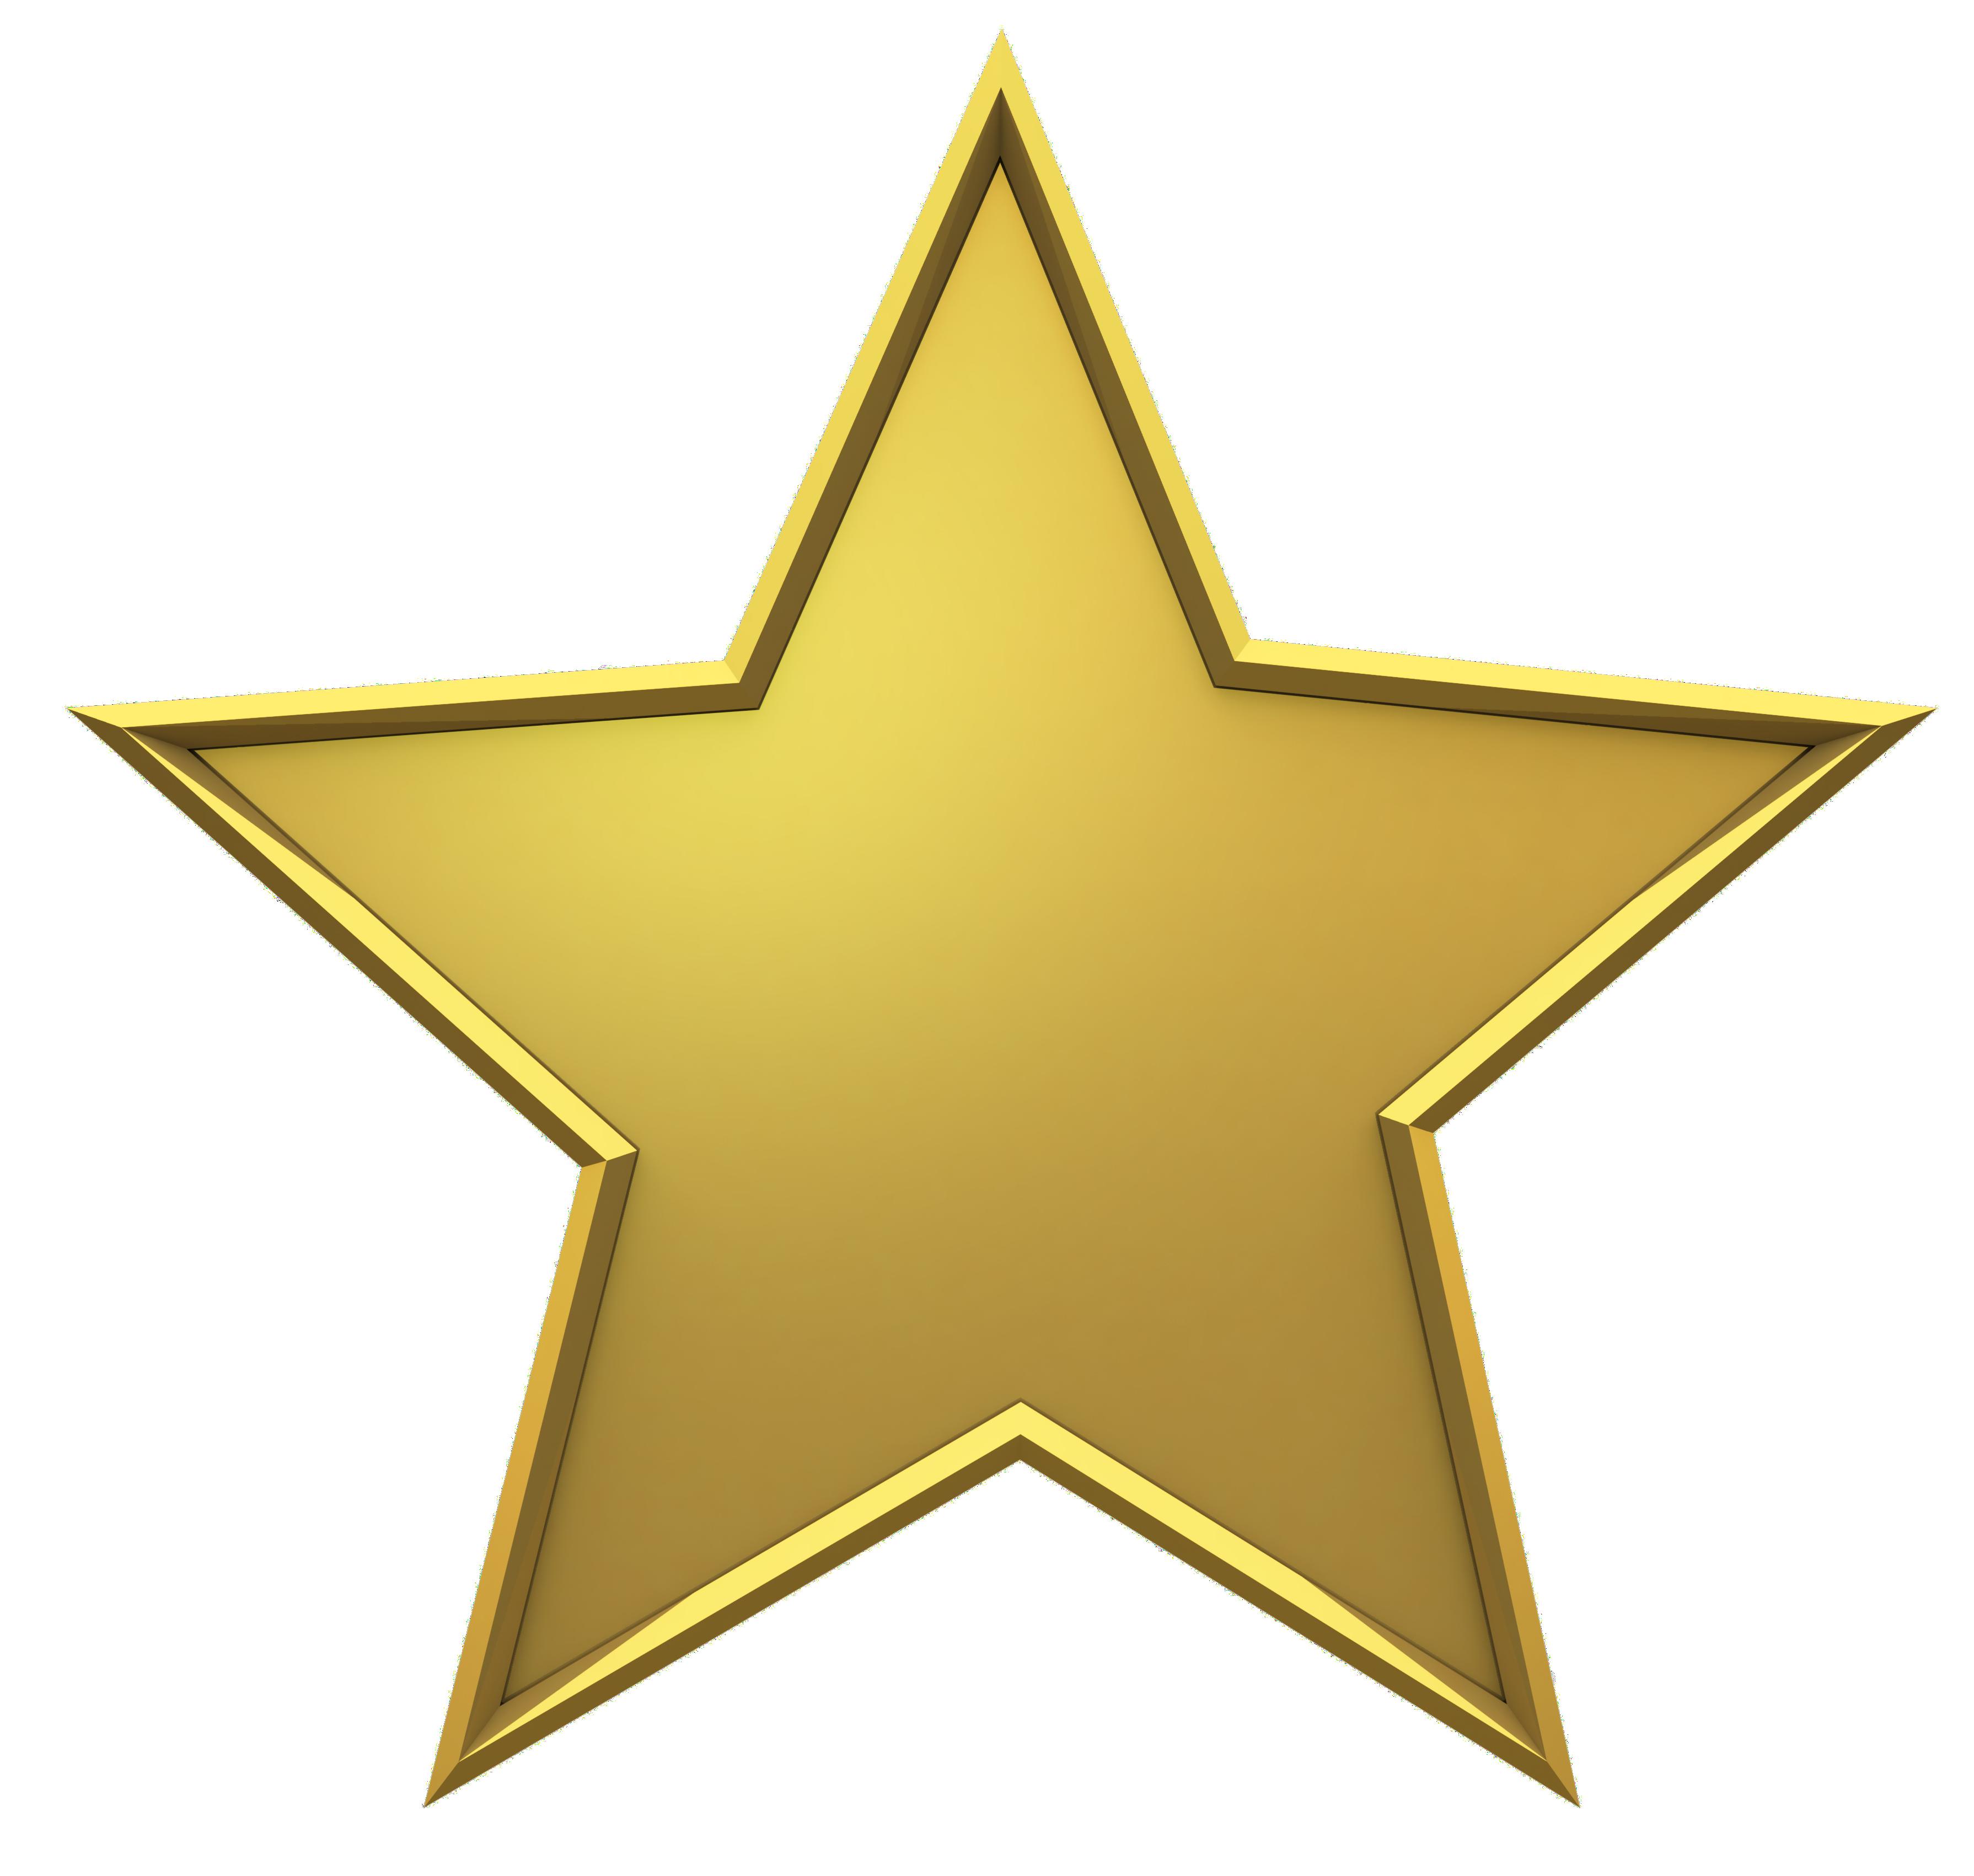 Star PNG Image Star PNG Image image #615 - Stars PNG